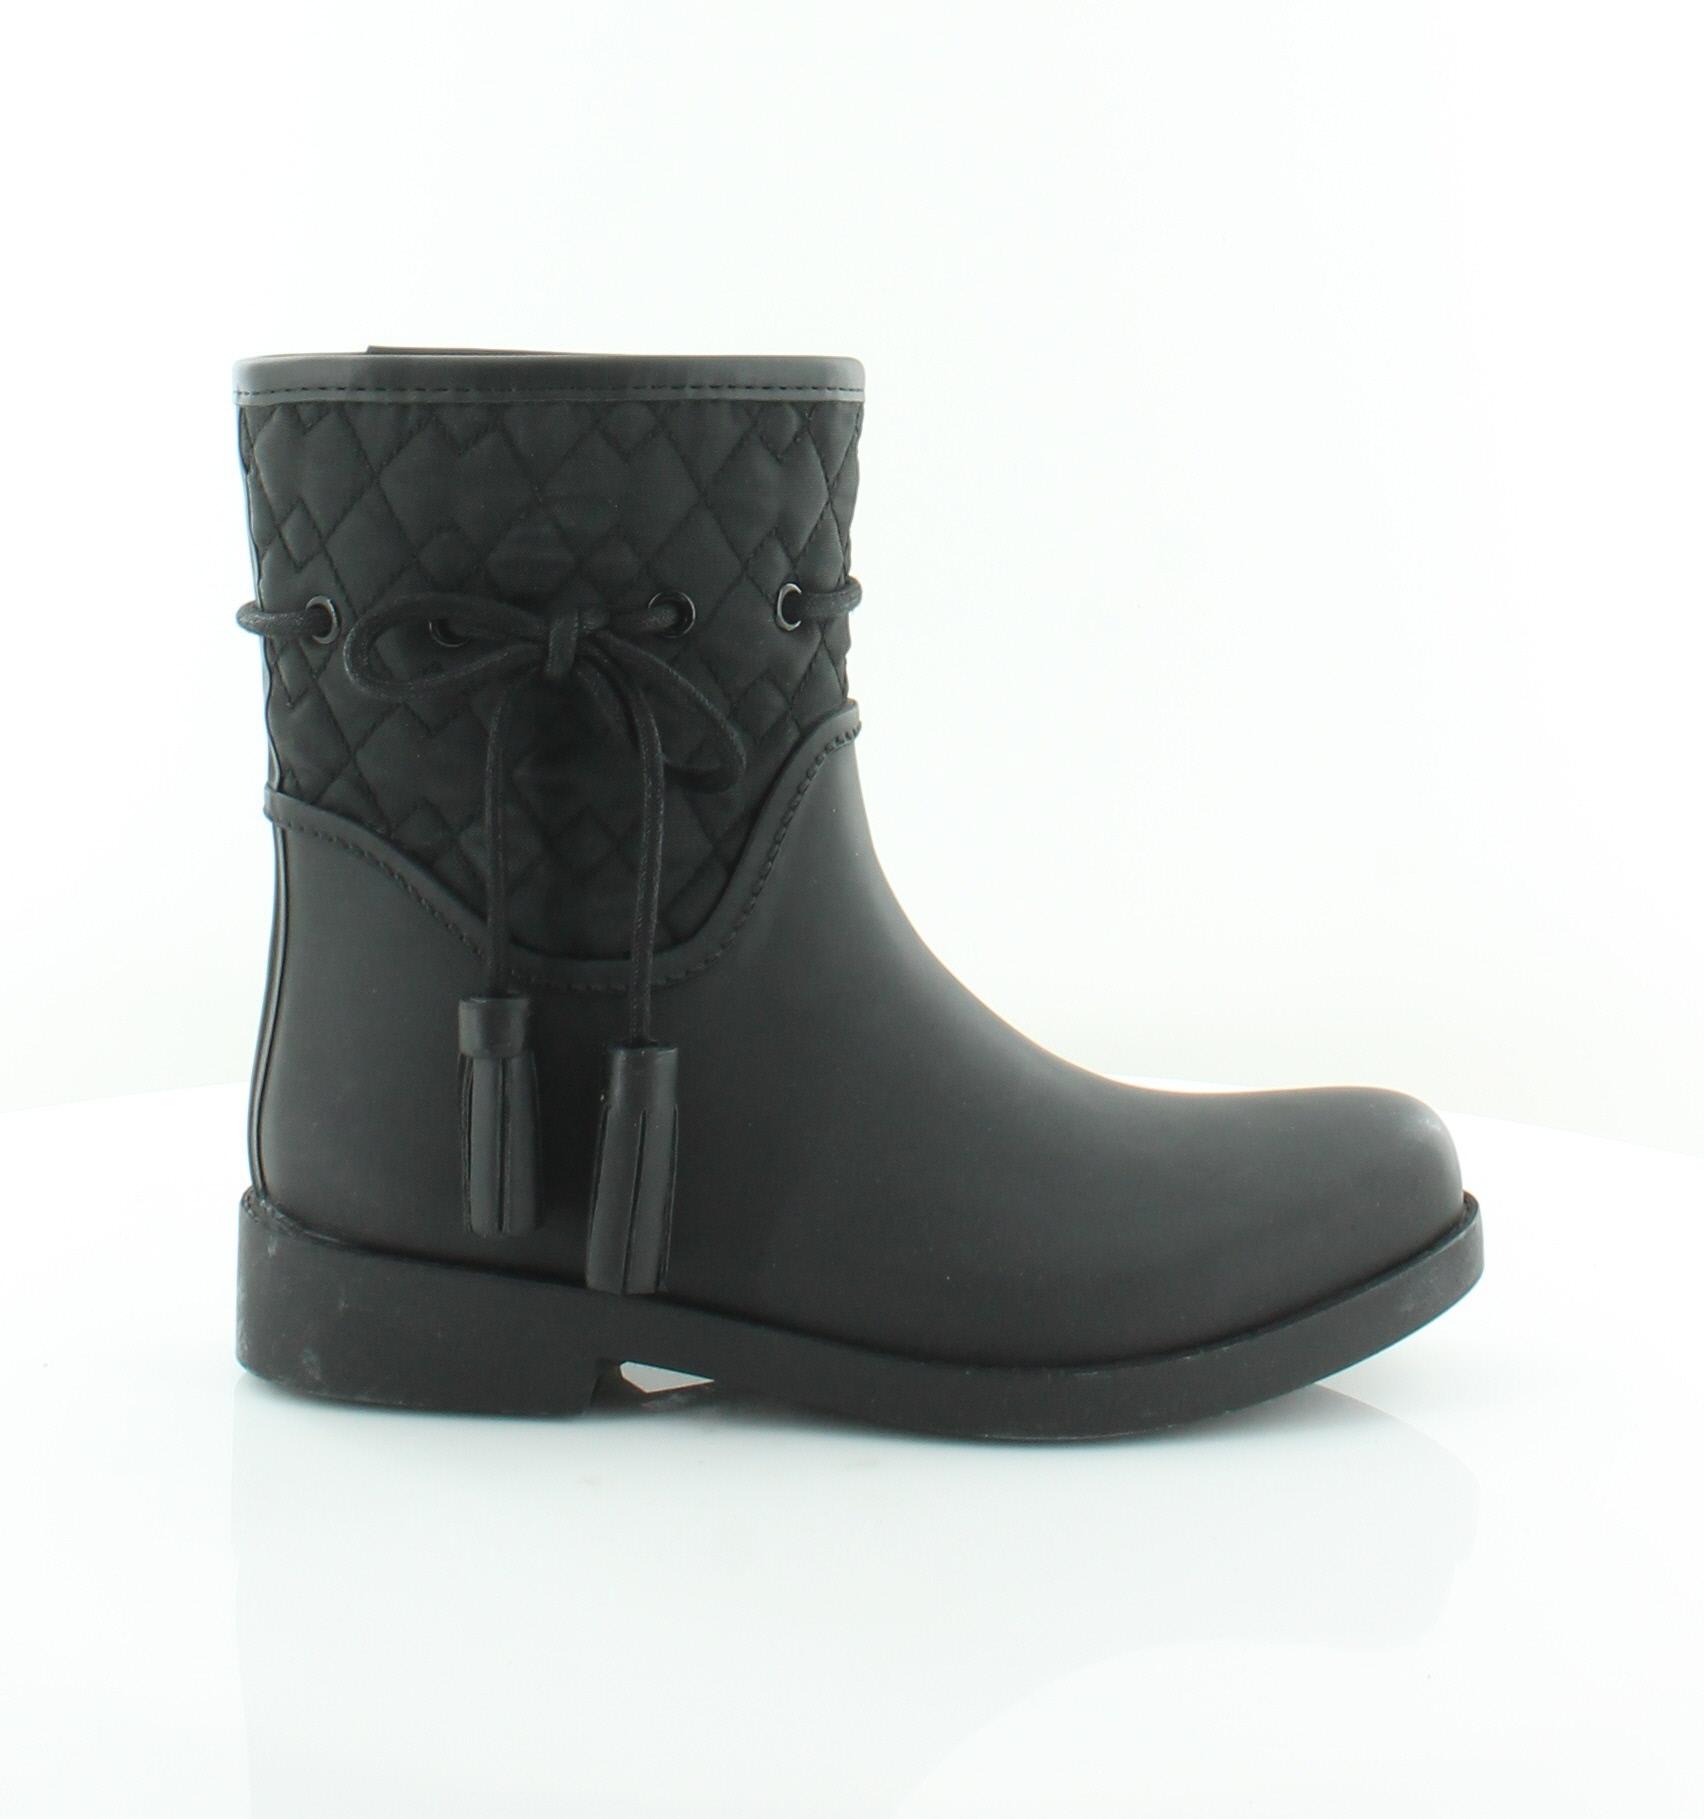 Jessica Simpson Racyn Women's Boots Flannel Black Size 7 M